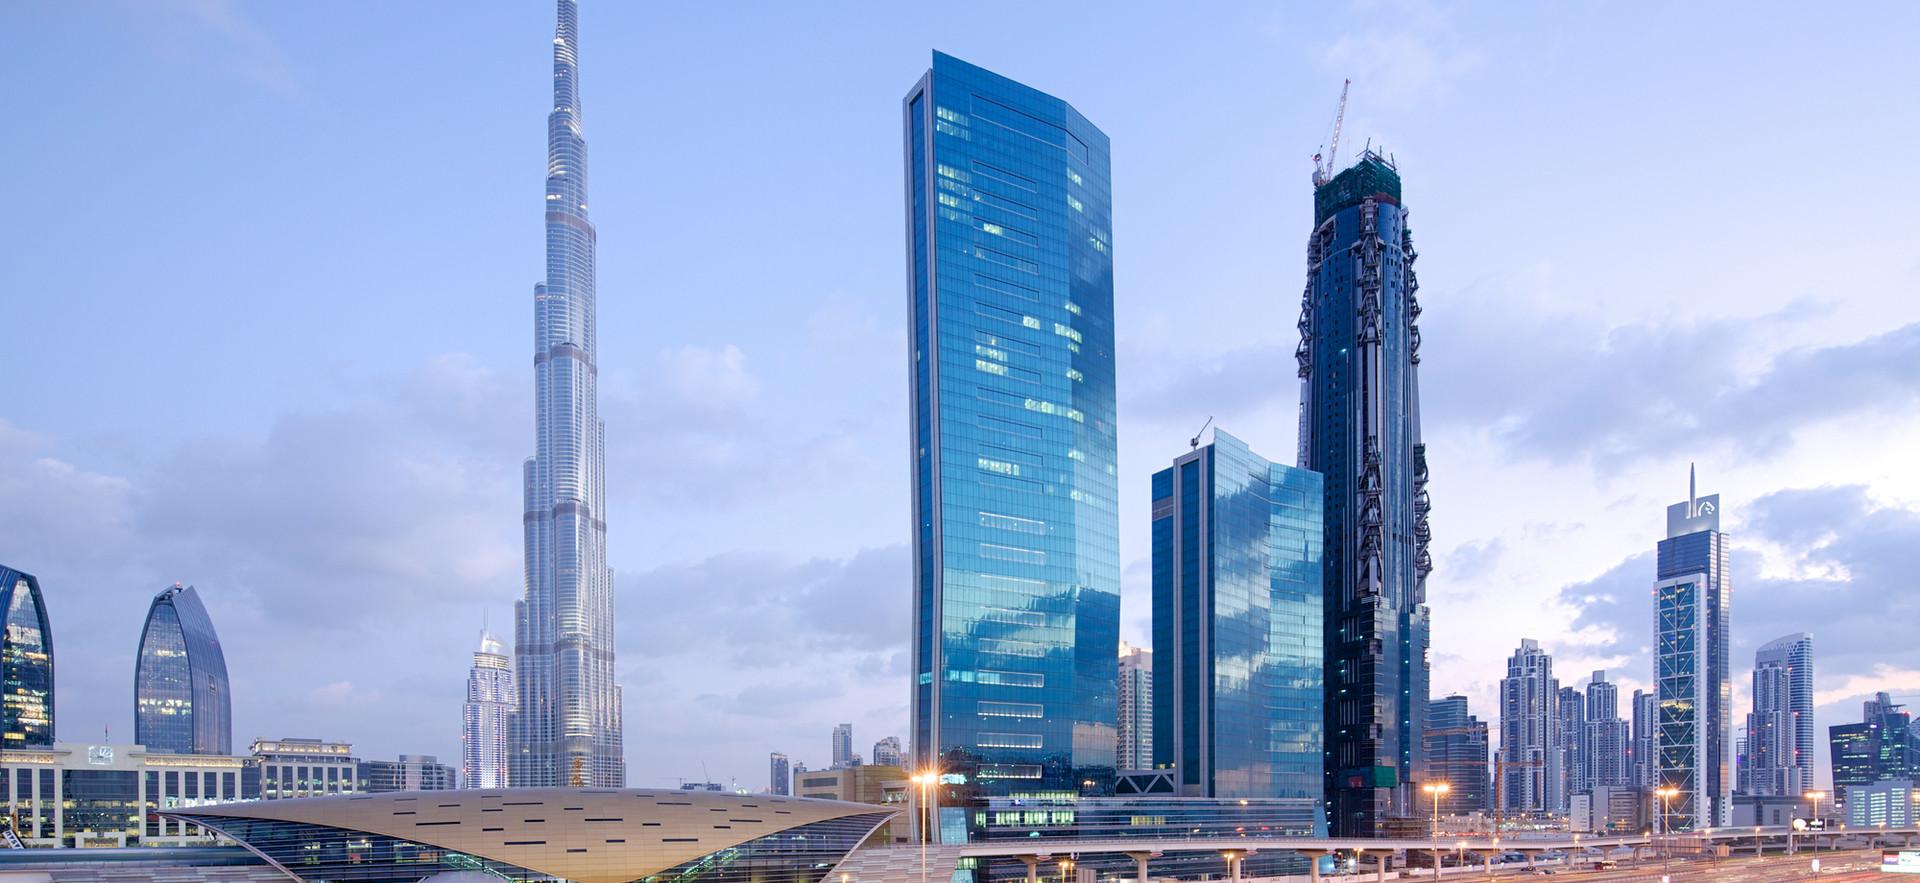 Sofitel Dubai Downtown & 48 Burj Gate